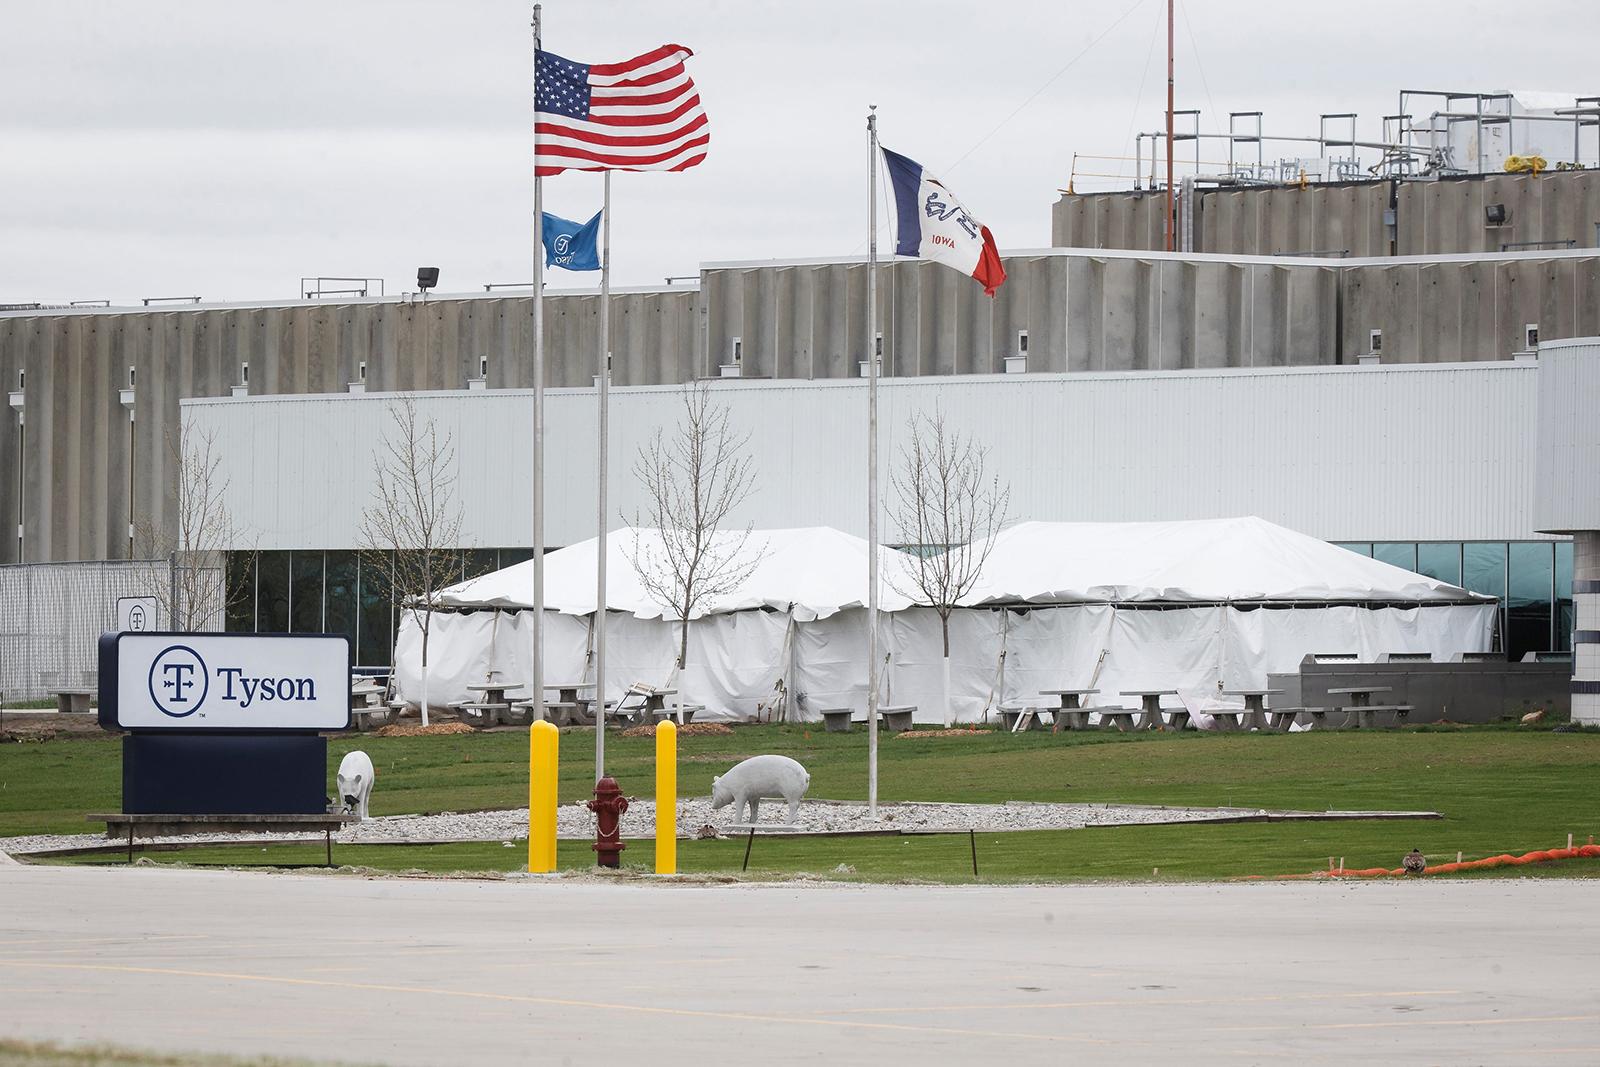 Tyson meat plant employee dies of Covid-19 weeks after major outbreak